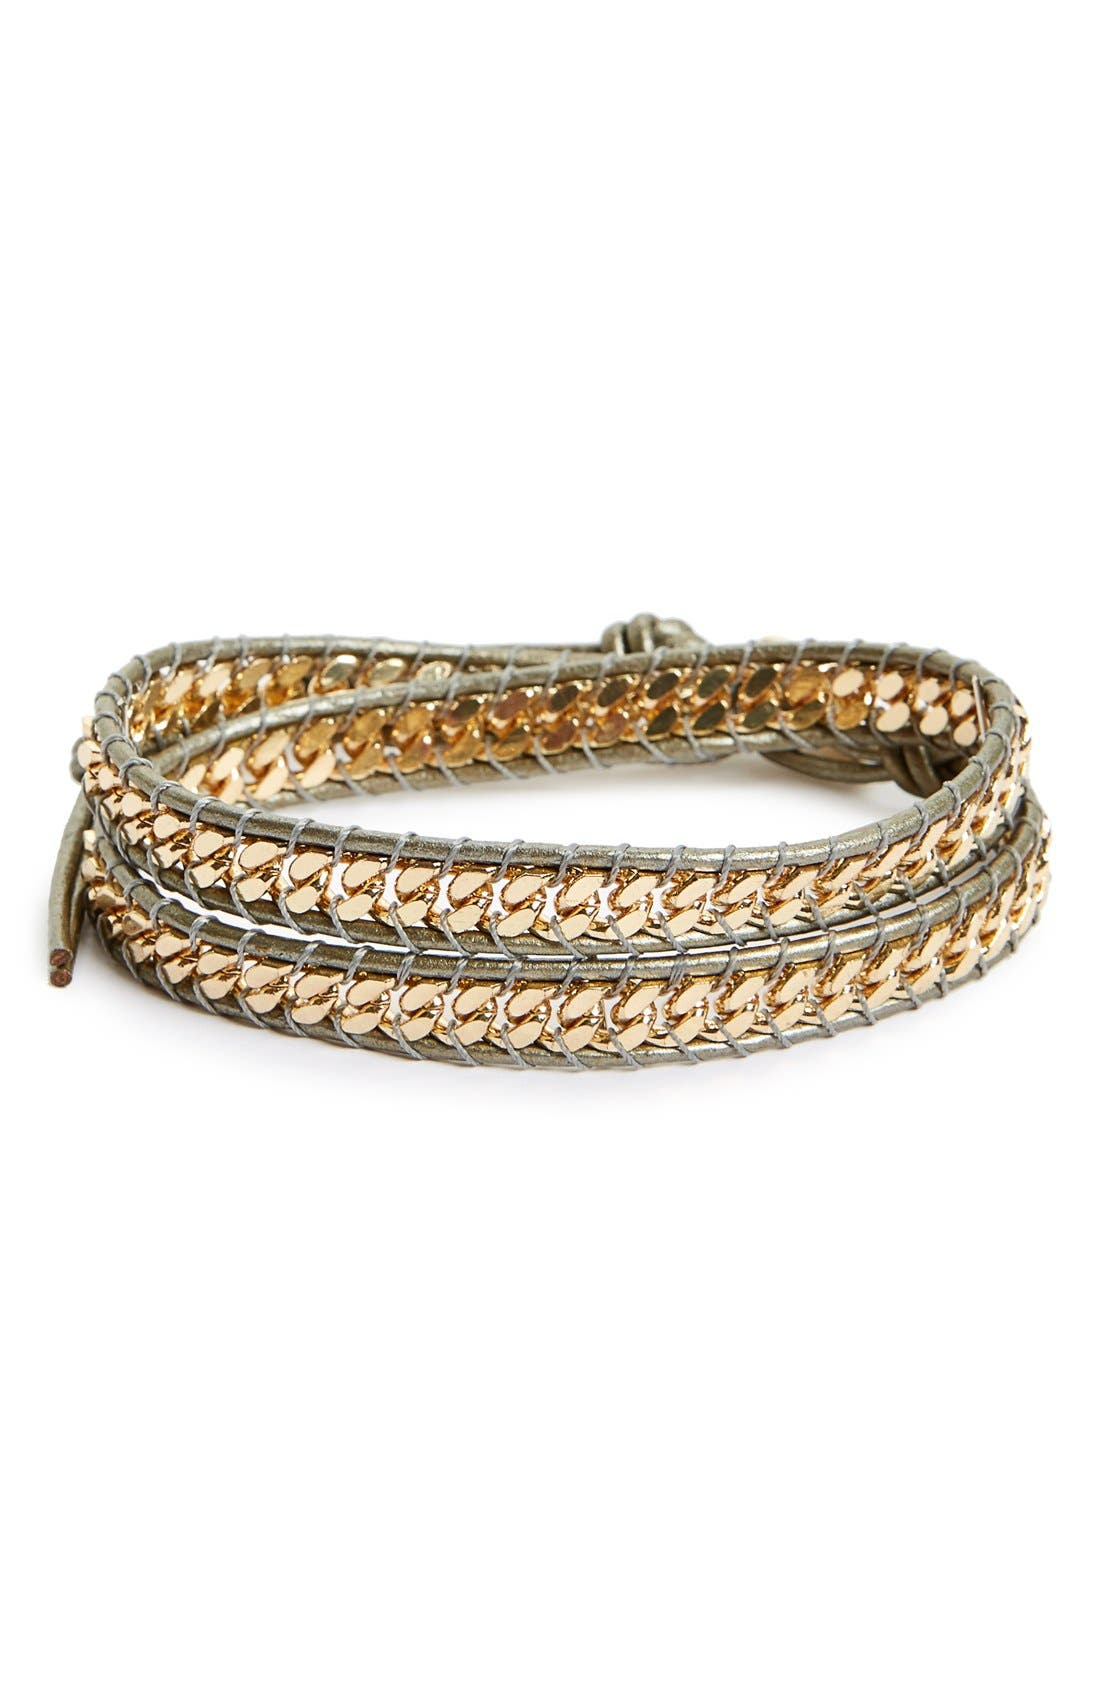 Alternate Image 1 Selected - Panacea Curb Chain Wrap Bracelet